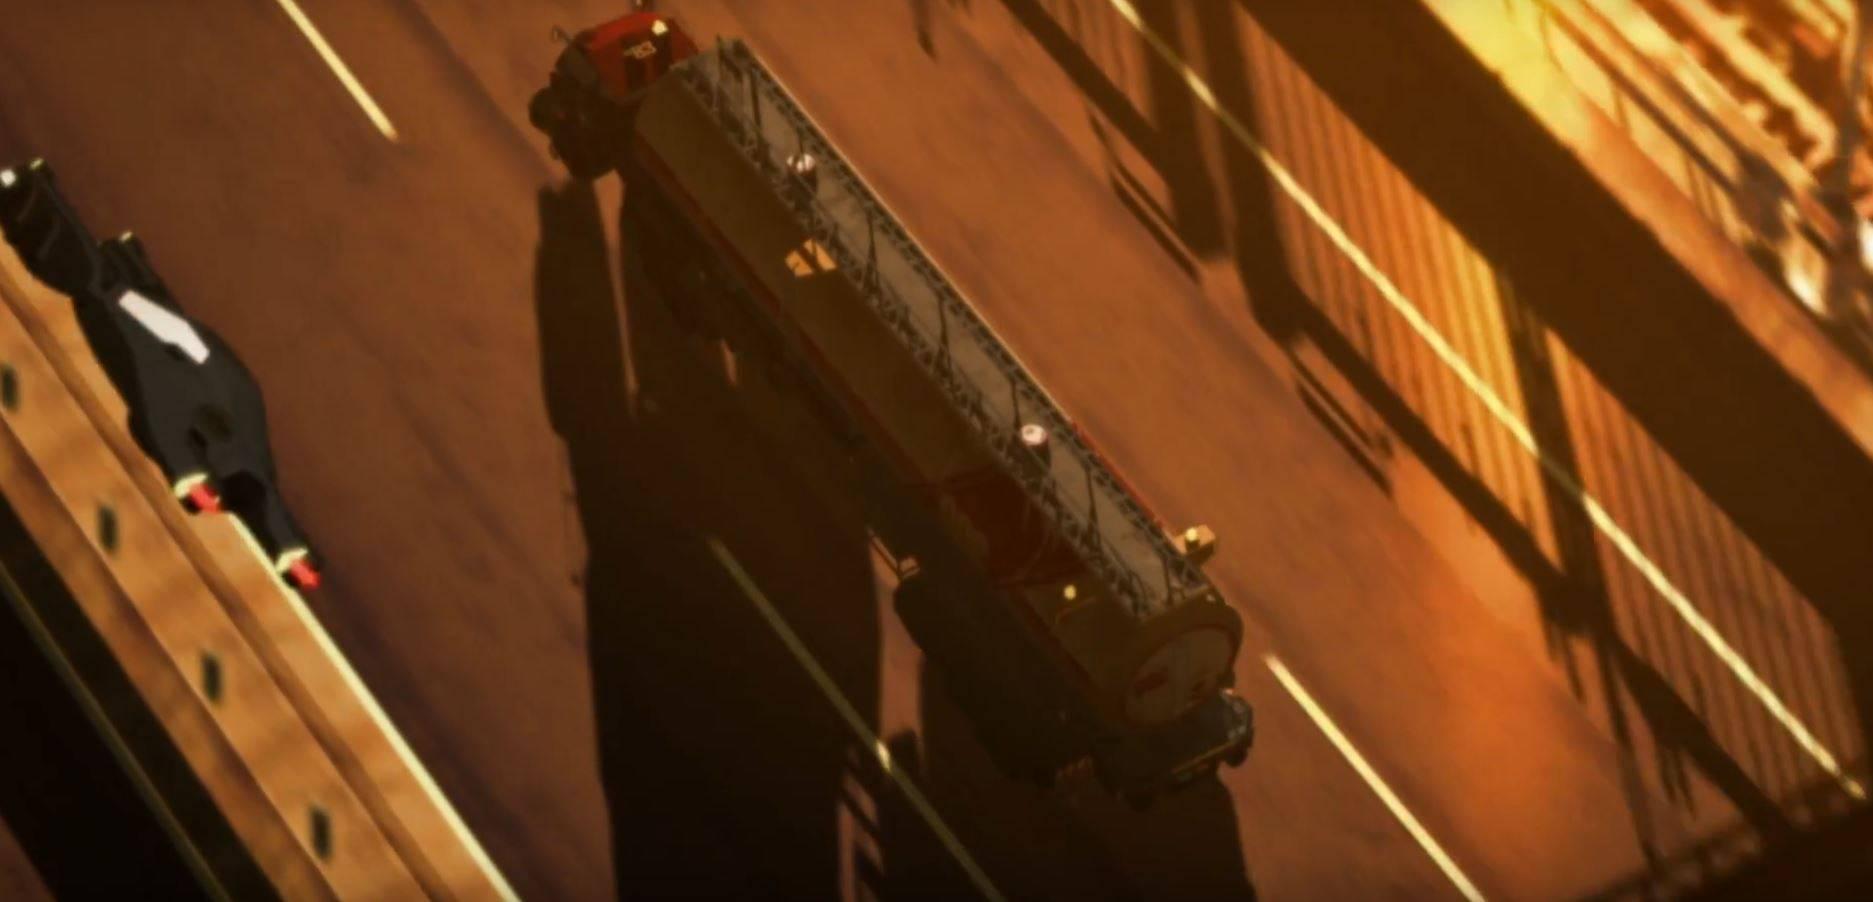 Короткометражка: Black Out 2022 аниме-приквел «Бегущего по лезвию 2049»